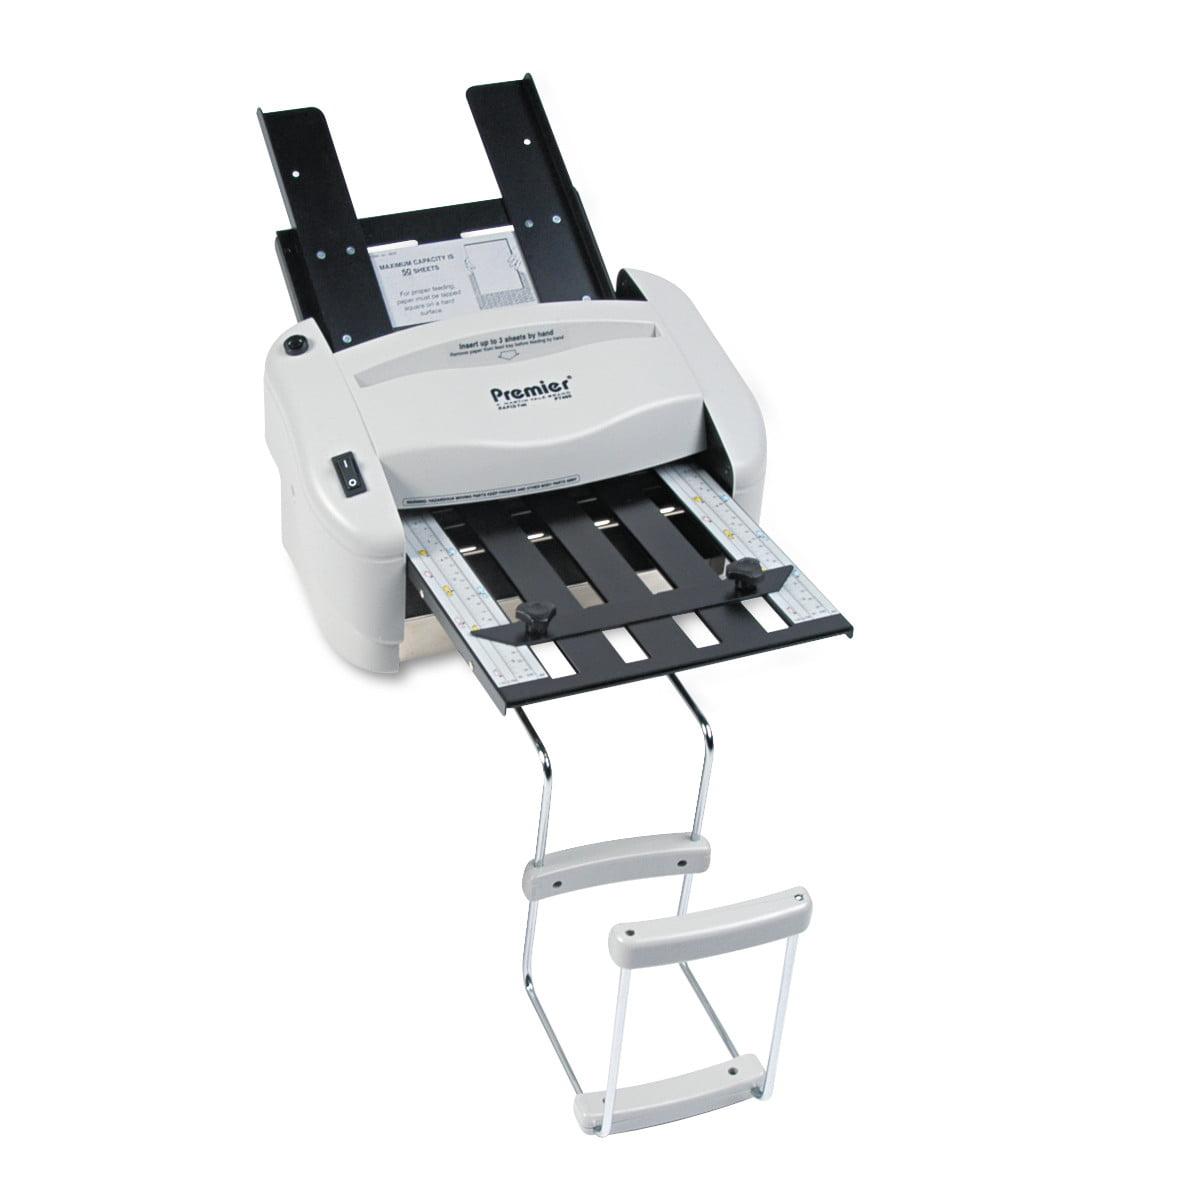 Martin Yale Model P7400 RapidFold Light-Duty Desktop AutoFolder, 4000 Sheets/Hour -PREP7400